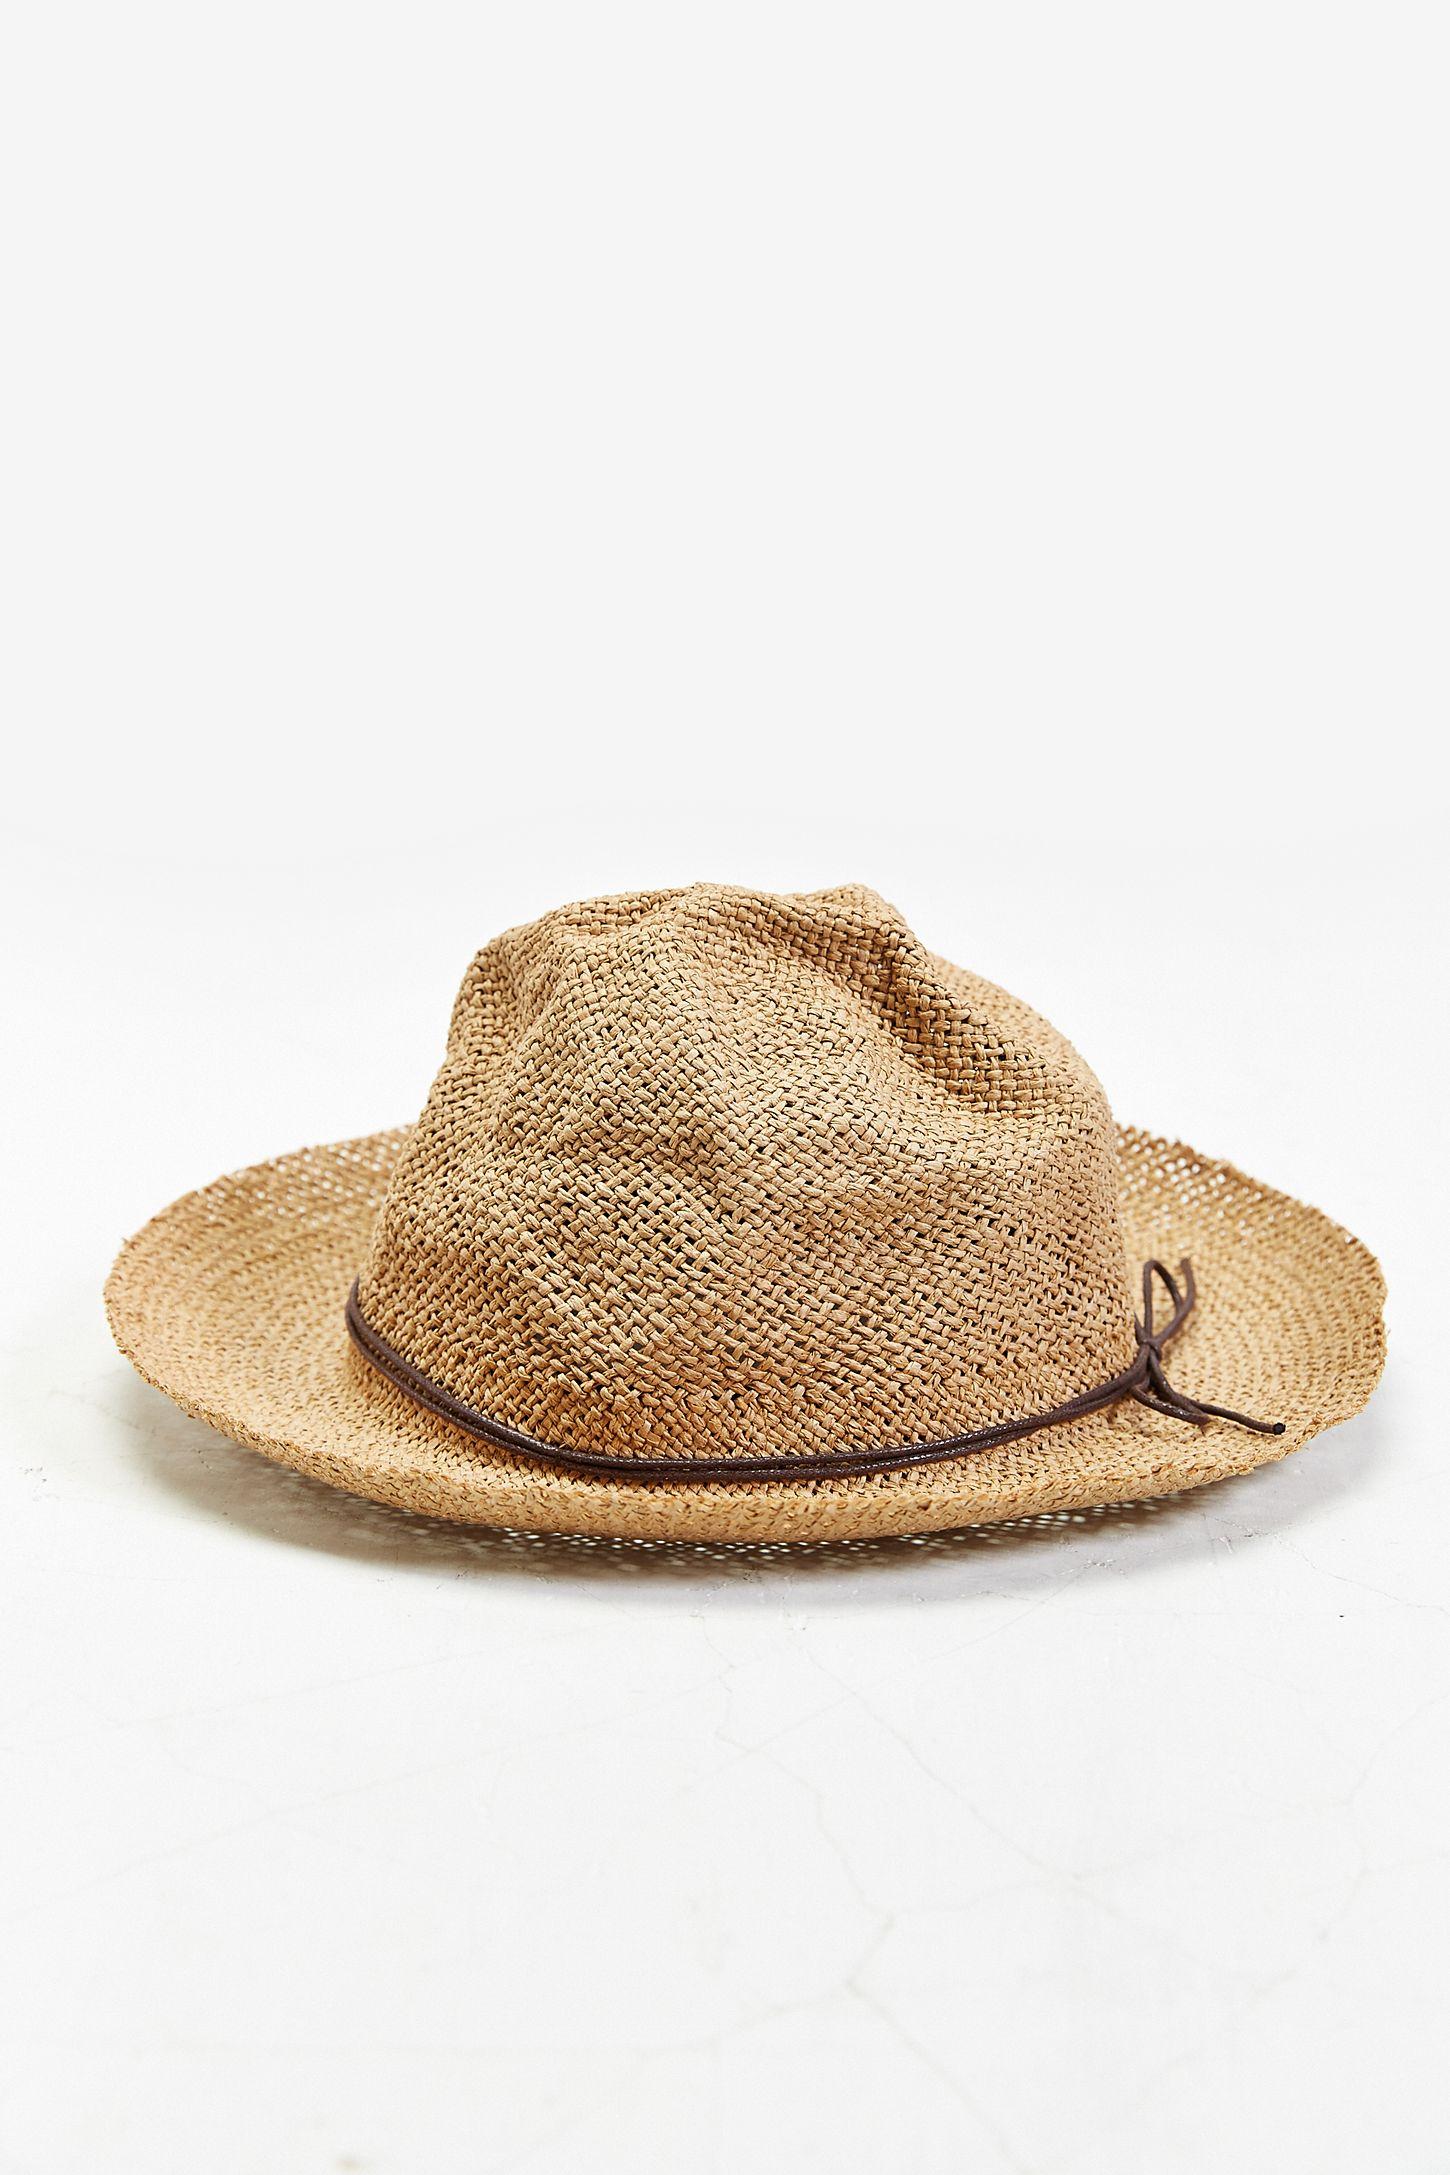 884808b46fe42 Rosin Overturned Brim Straw Hat